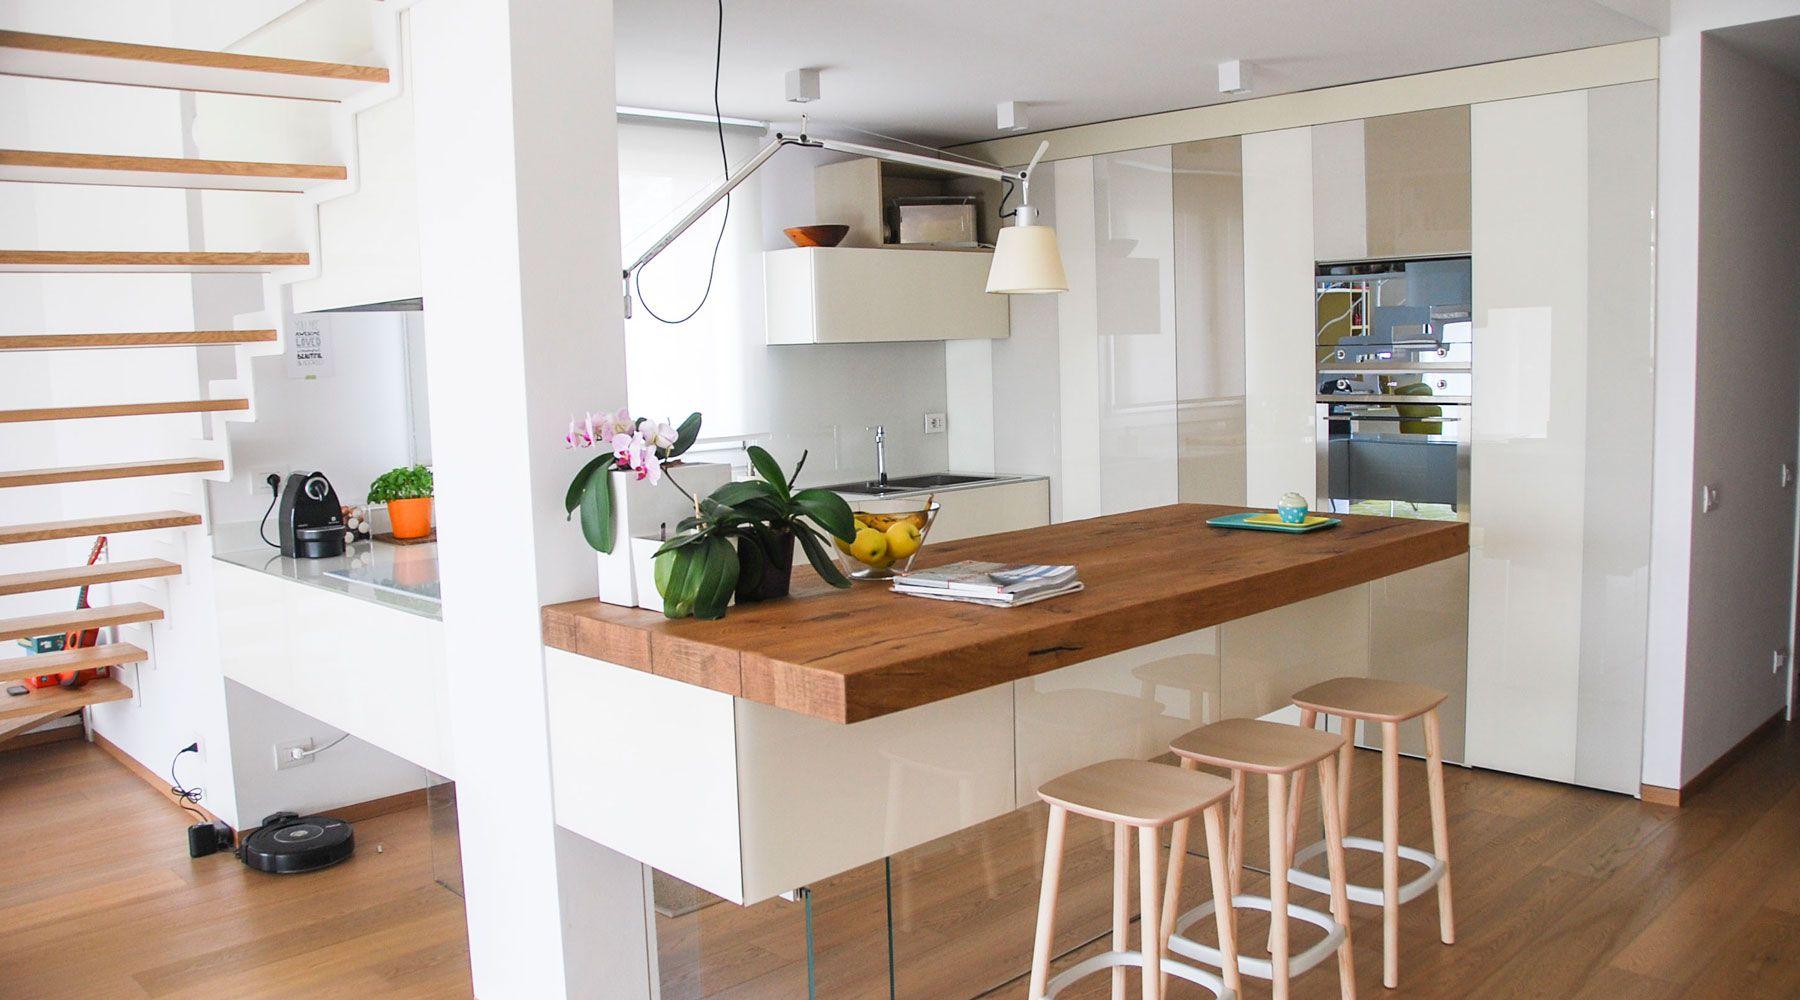 Cucina modulare sospesa con top, frontali o ante in legno rovere ...